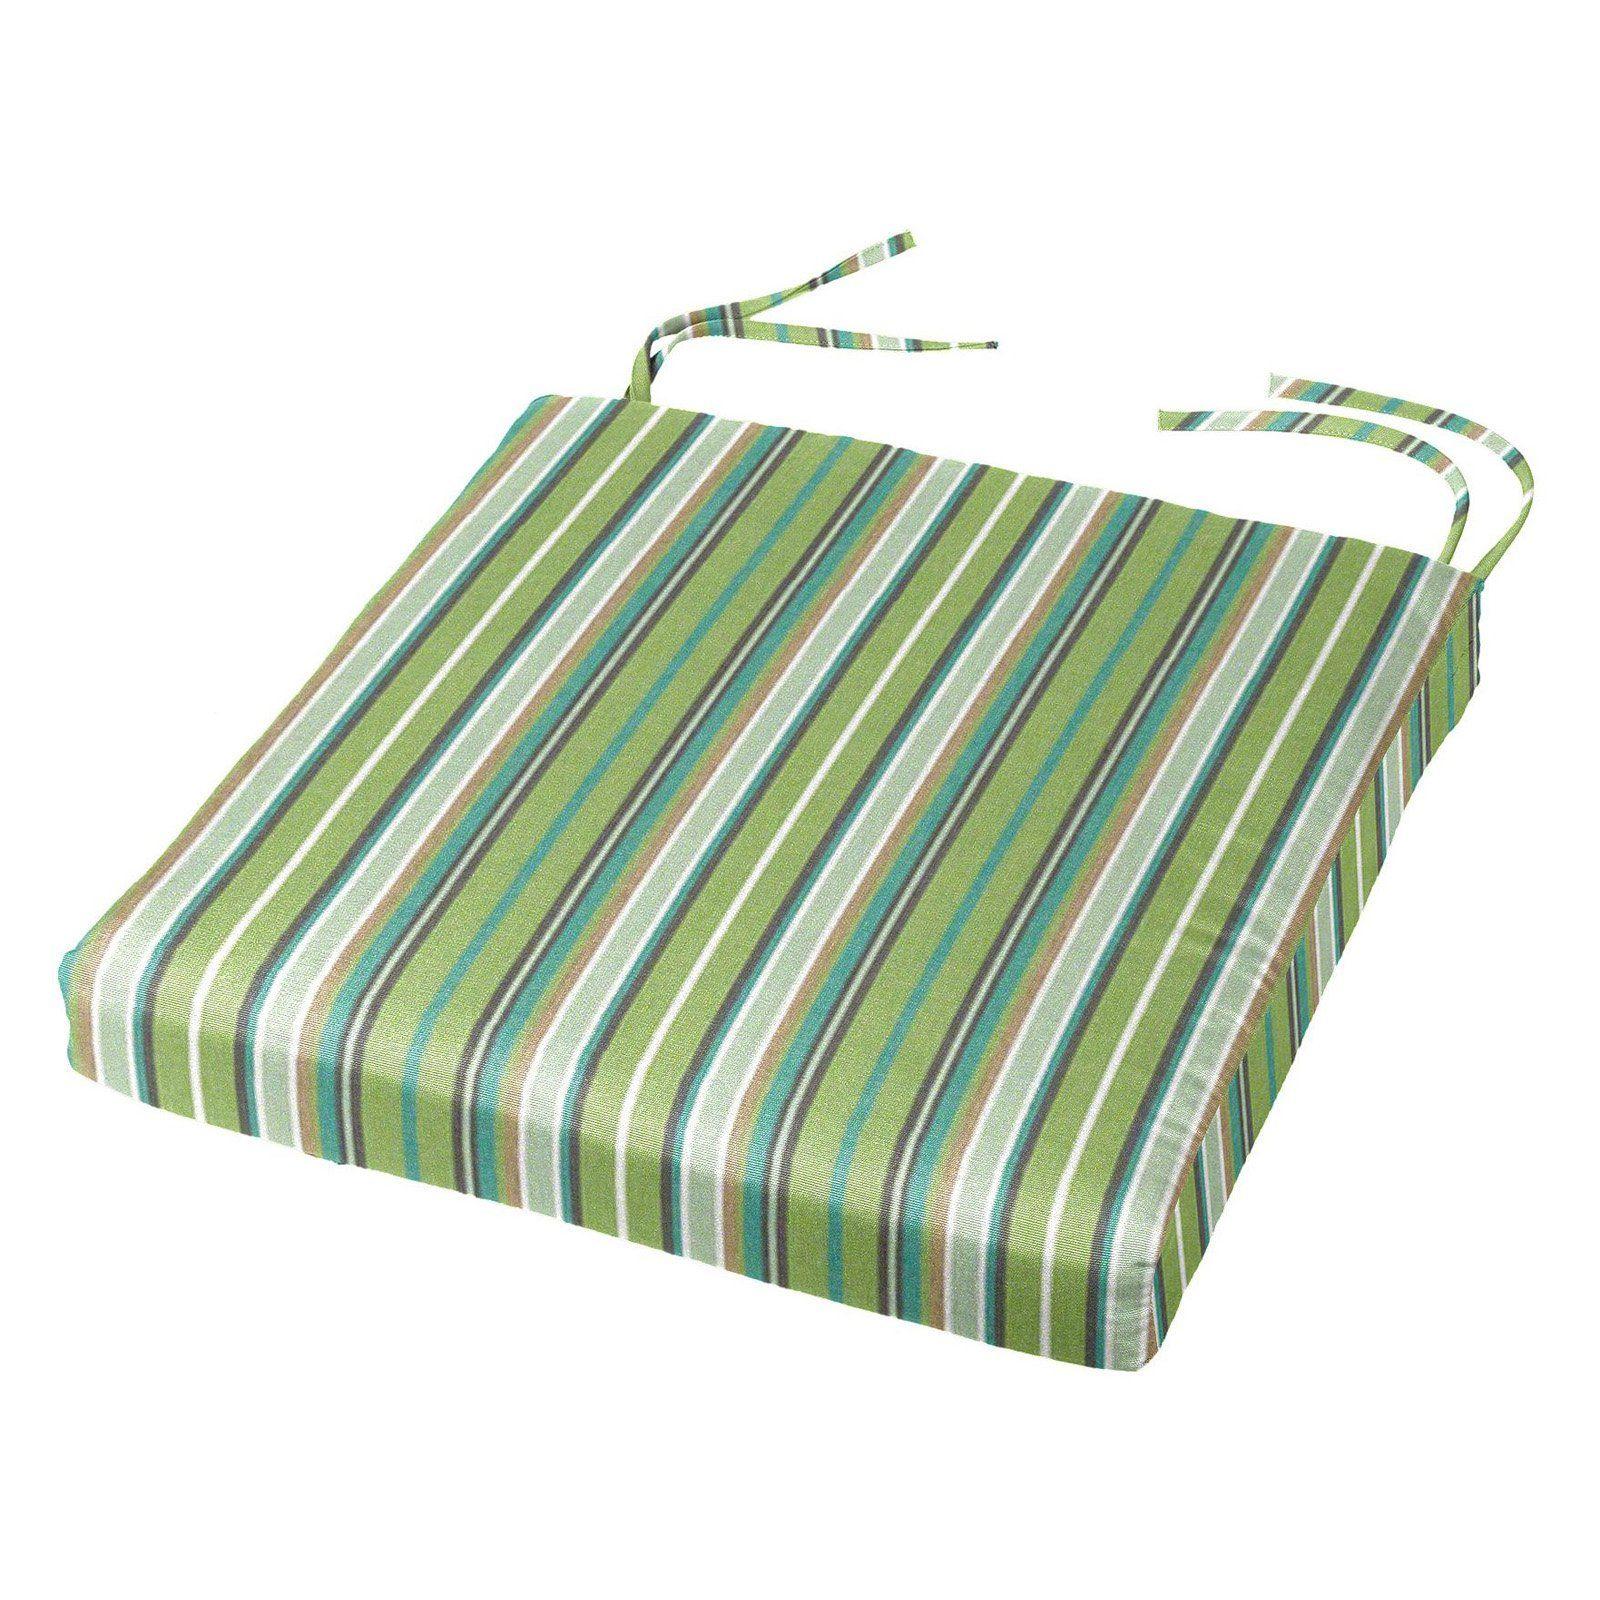 Cushion Source 16 X 16 In Striped Sunbrella Dining Chair Pad